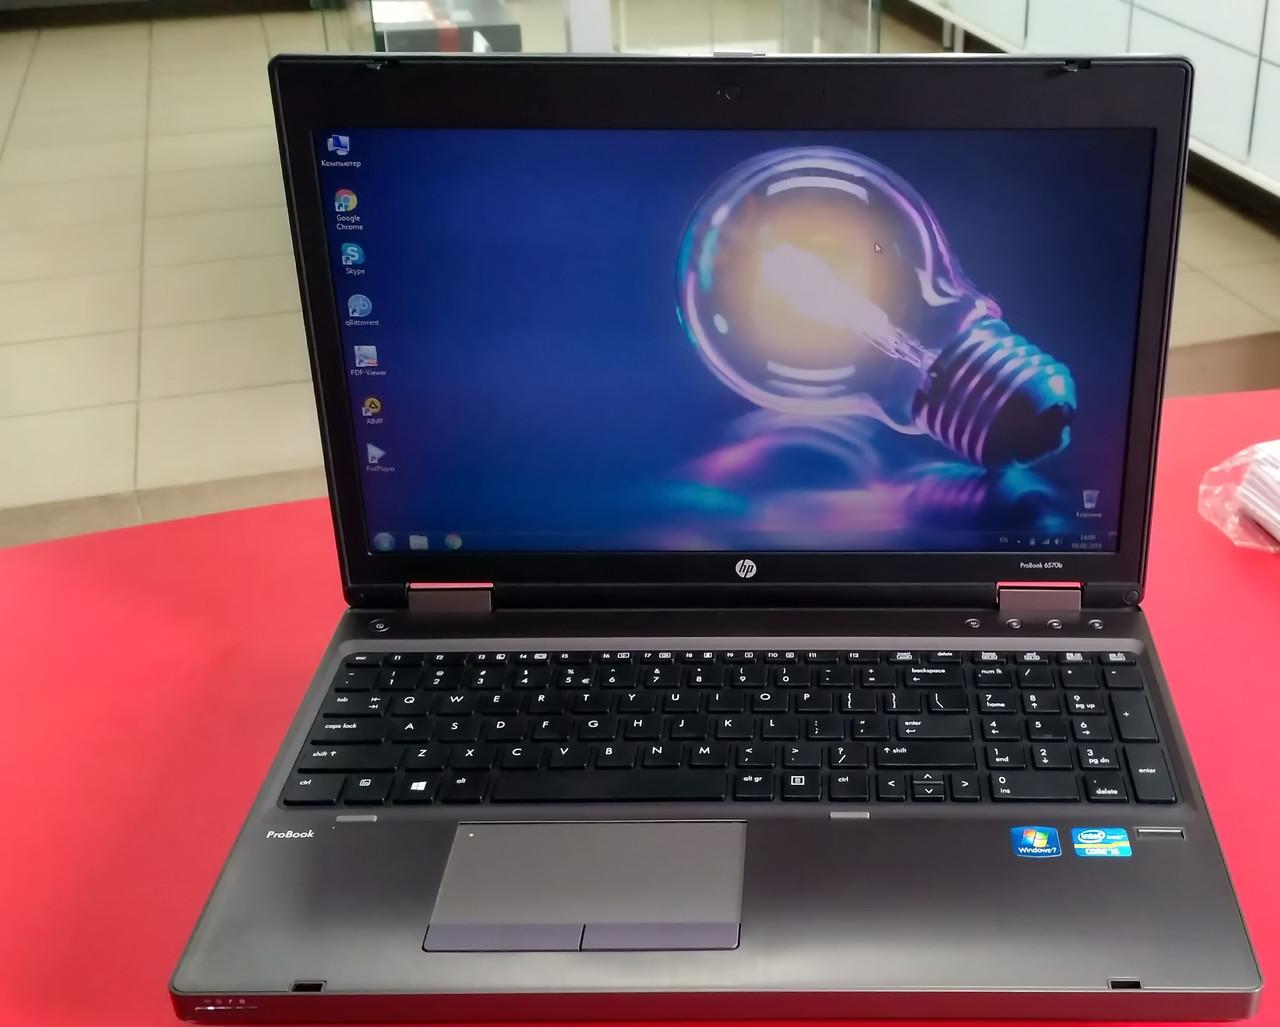 "Ноутбук HP ProBook 6570b 15.6"" Intel Core i5 2.6 GHz 4 GB RAM 256 GB SSD Silver Б/У"